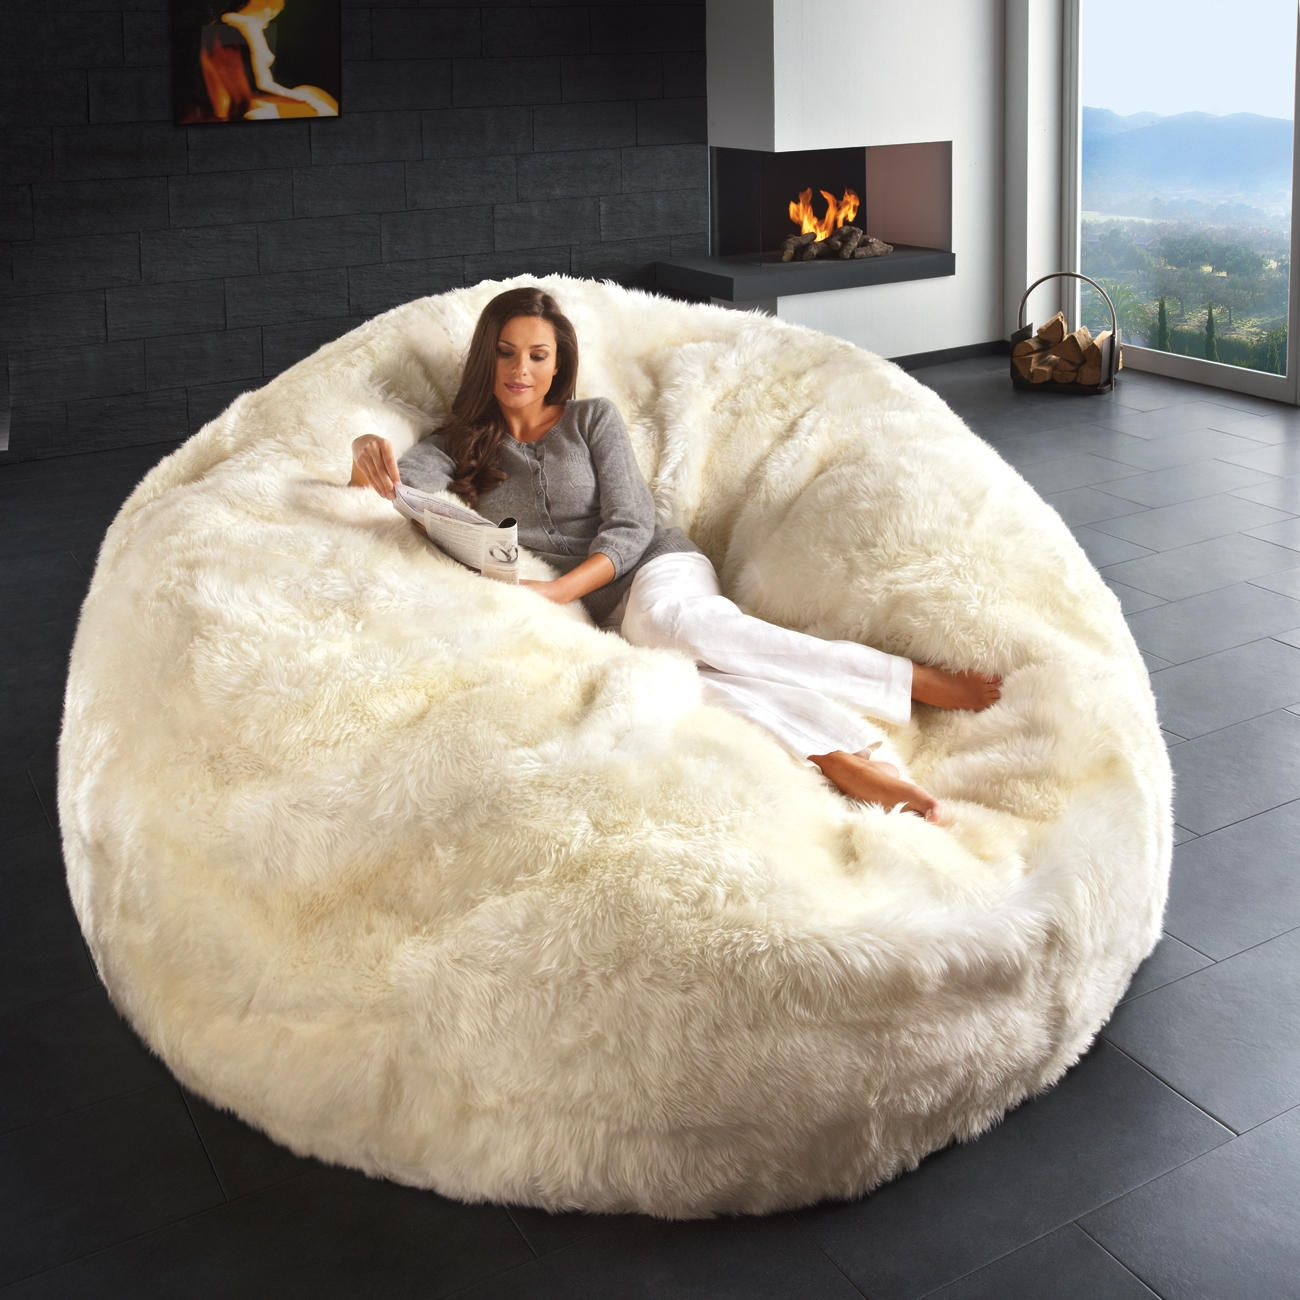 Huge Comfy Sitting Bag Pro Idee Concept Store Home Decoratie Interieur Decoratie